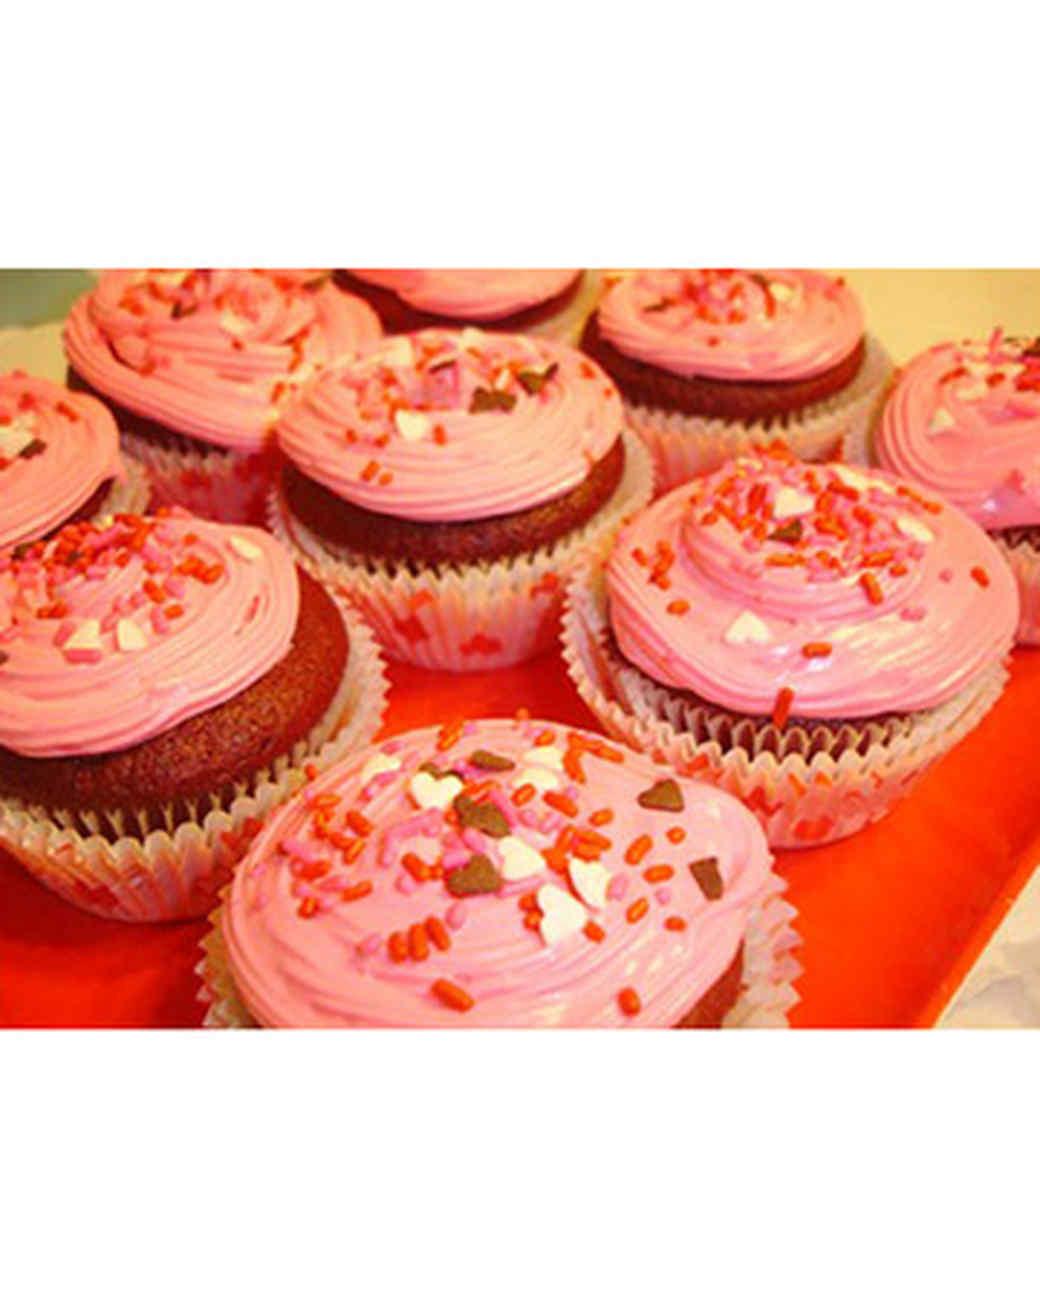 vday_treat_ugc09_ily_cupcakes.jpg